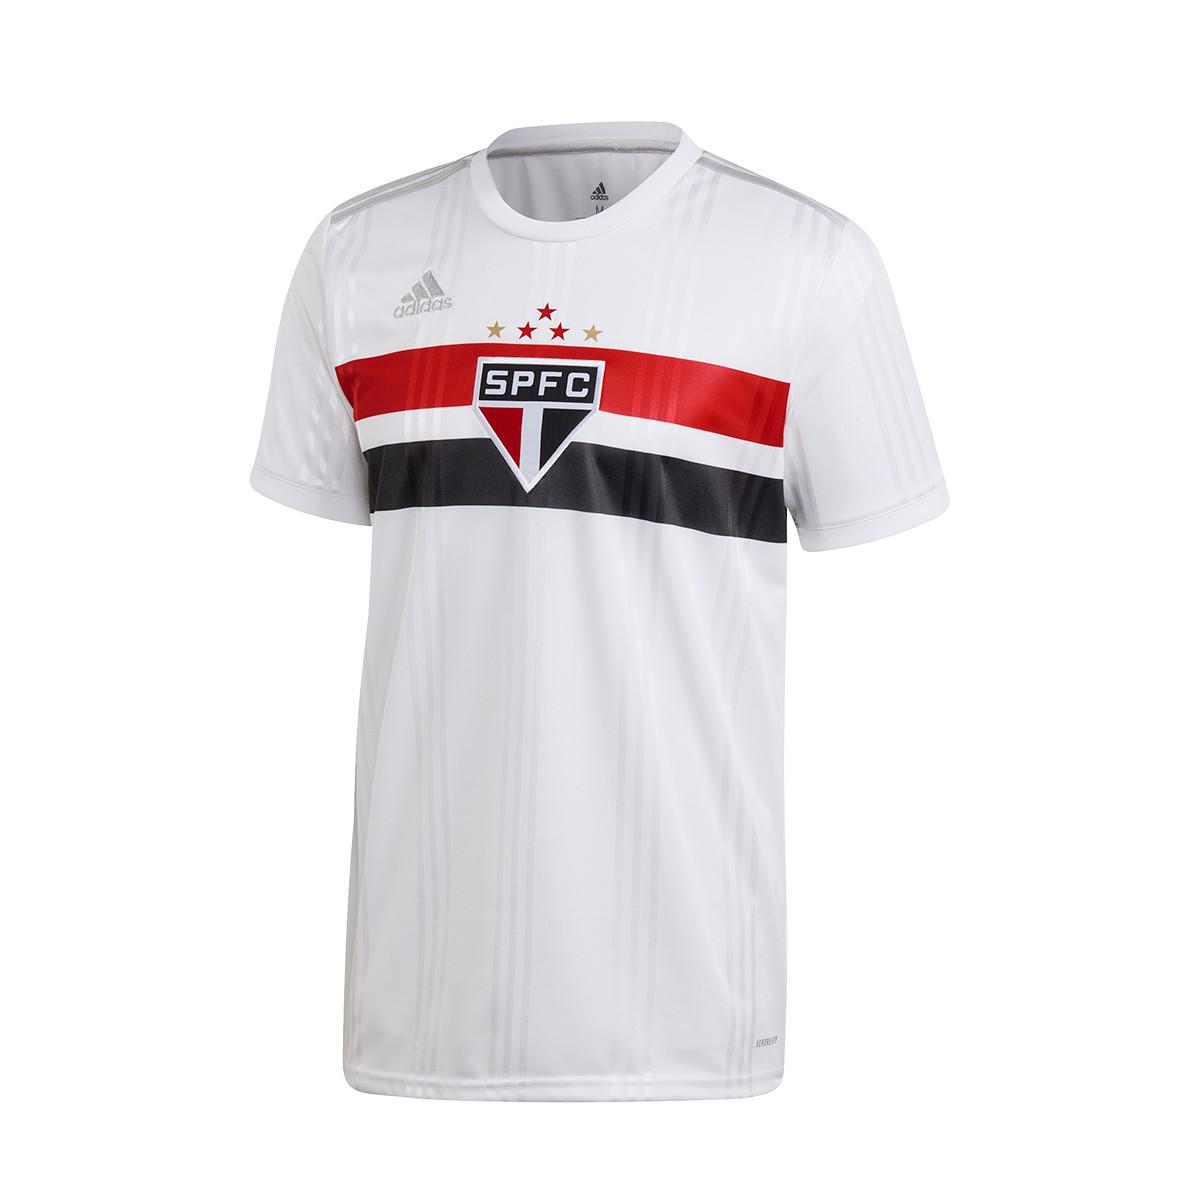 Camisola adidas São Paulo FC Equipamento Principal 2020 2021